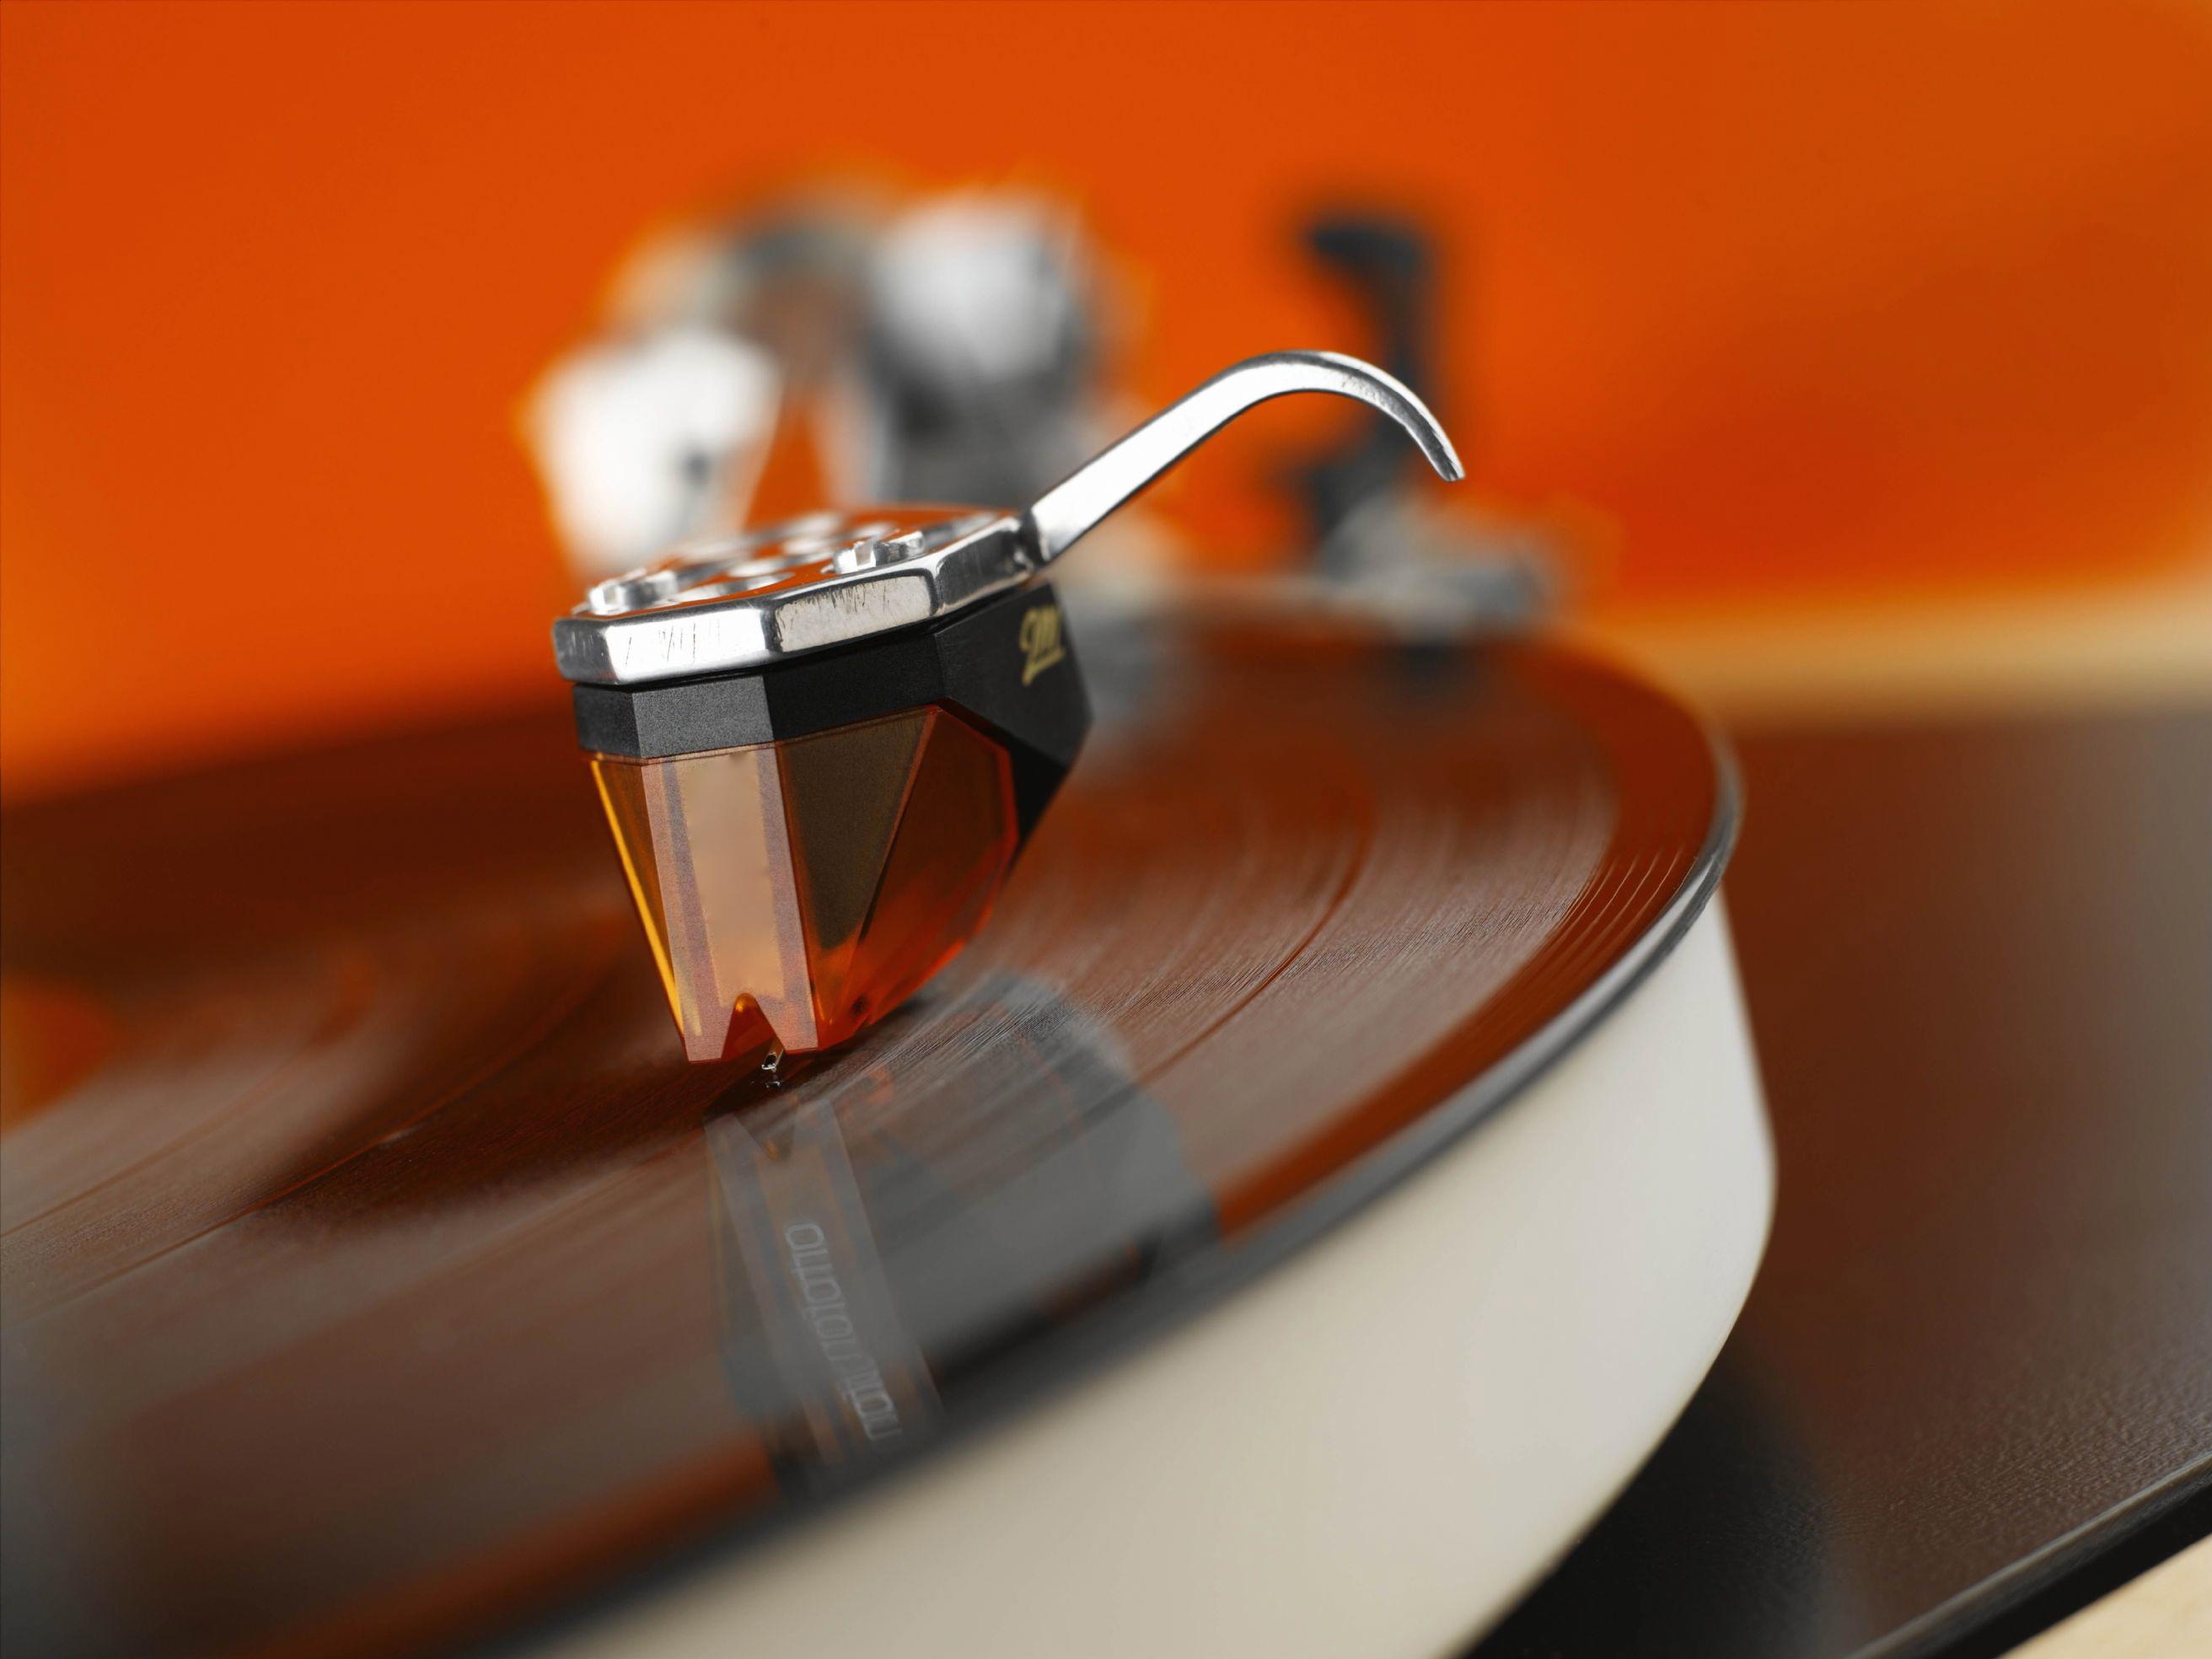 ortofon-2m-bronze-moving-magnet-cartridge-_3_-425-p_2_1-2